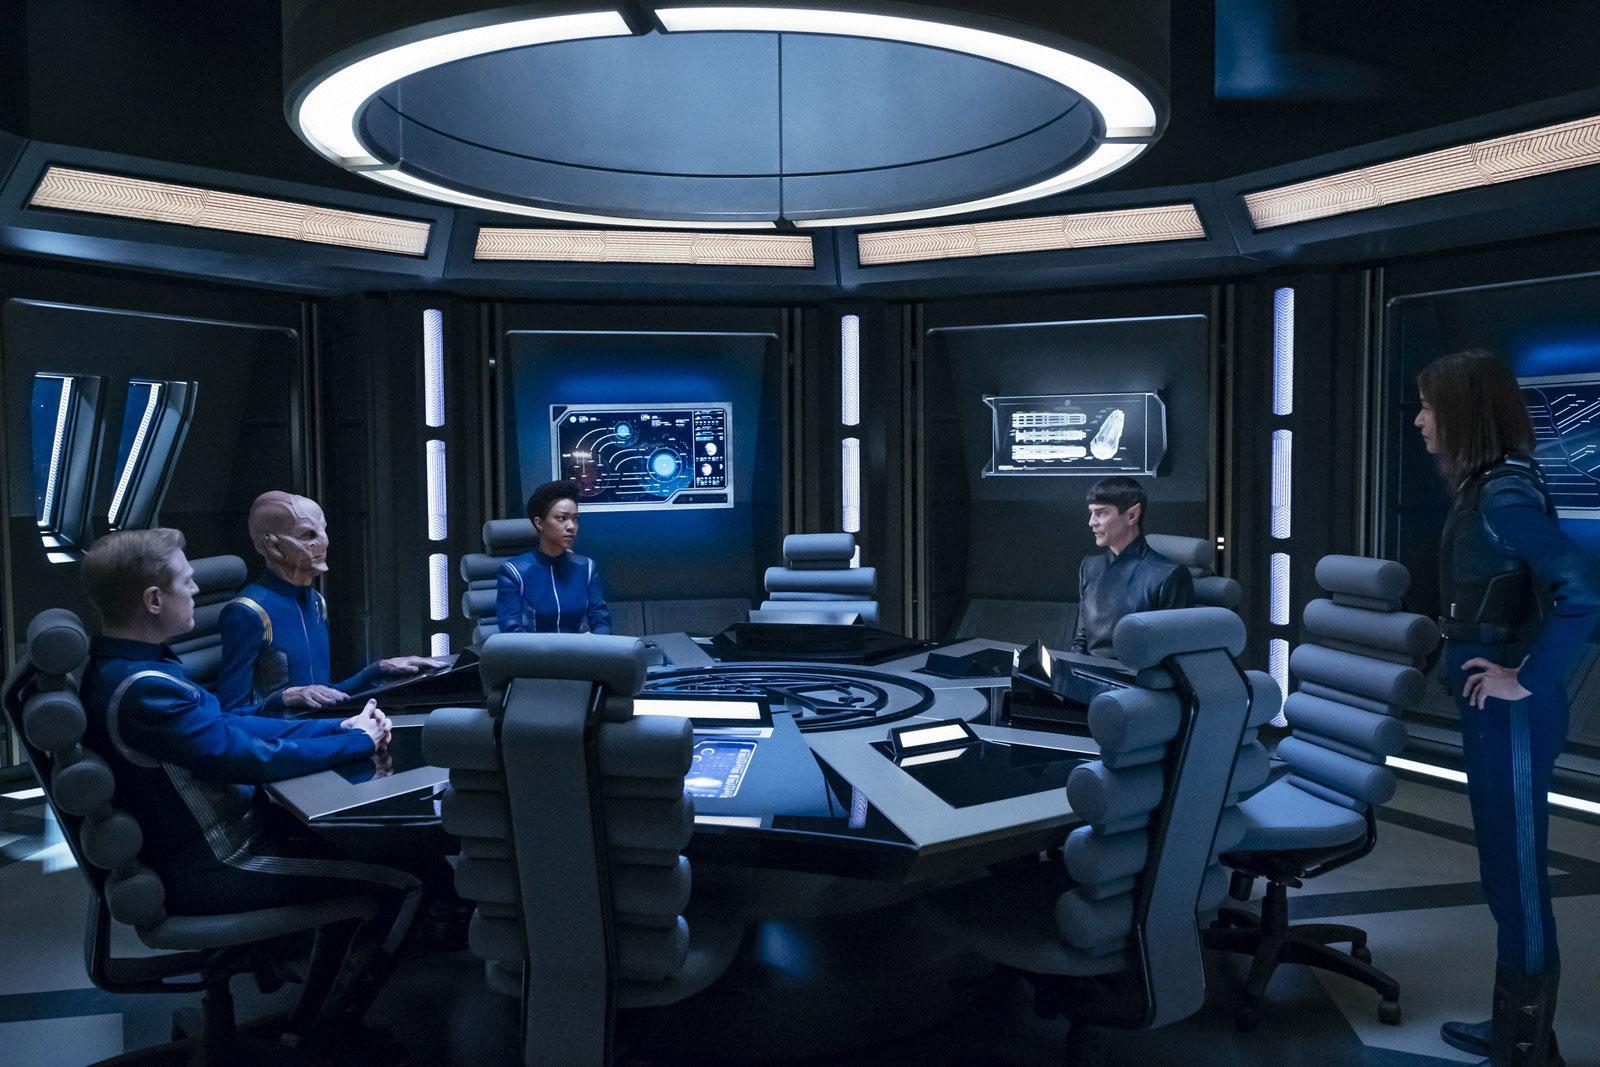 Anthony Rapp as Lieutenant Paul Stamets, Doug Jones as Saru, Sonequa Martin-Green as Michael Burnham, James Frain as Ambassador Sarek and Jayne Brook as Admiral Cornwell